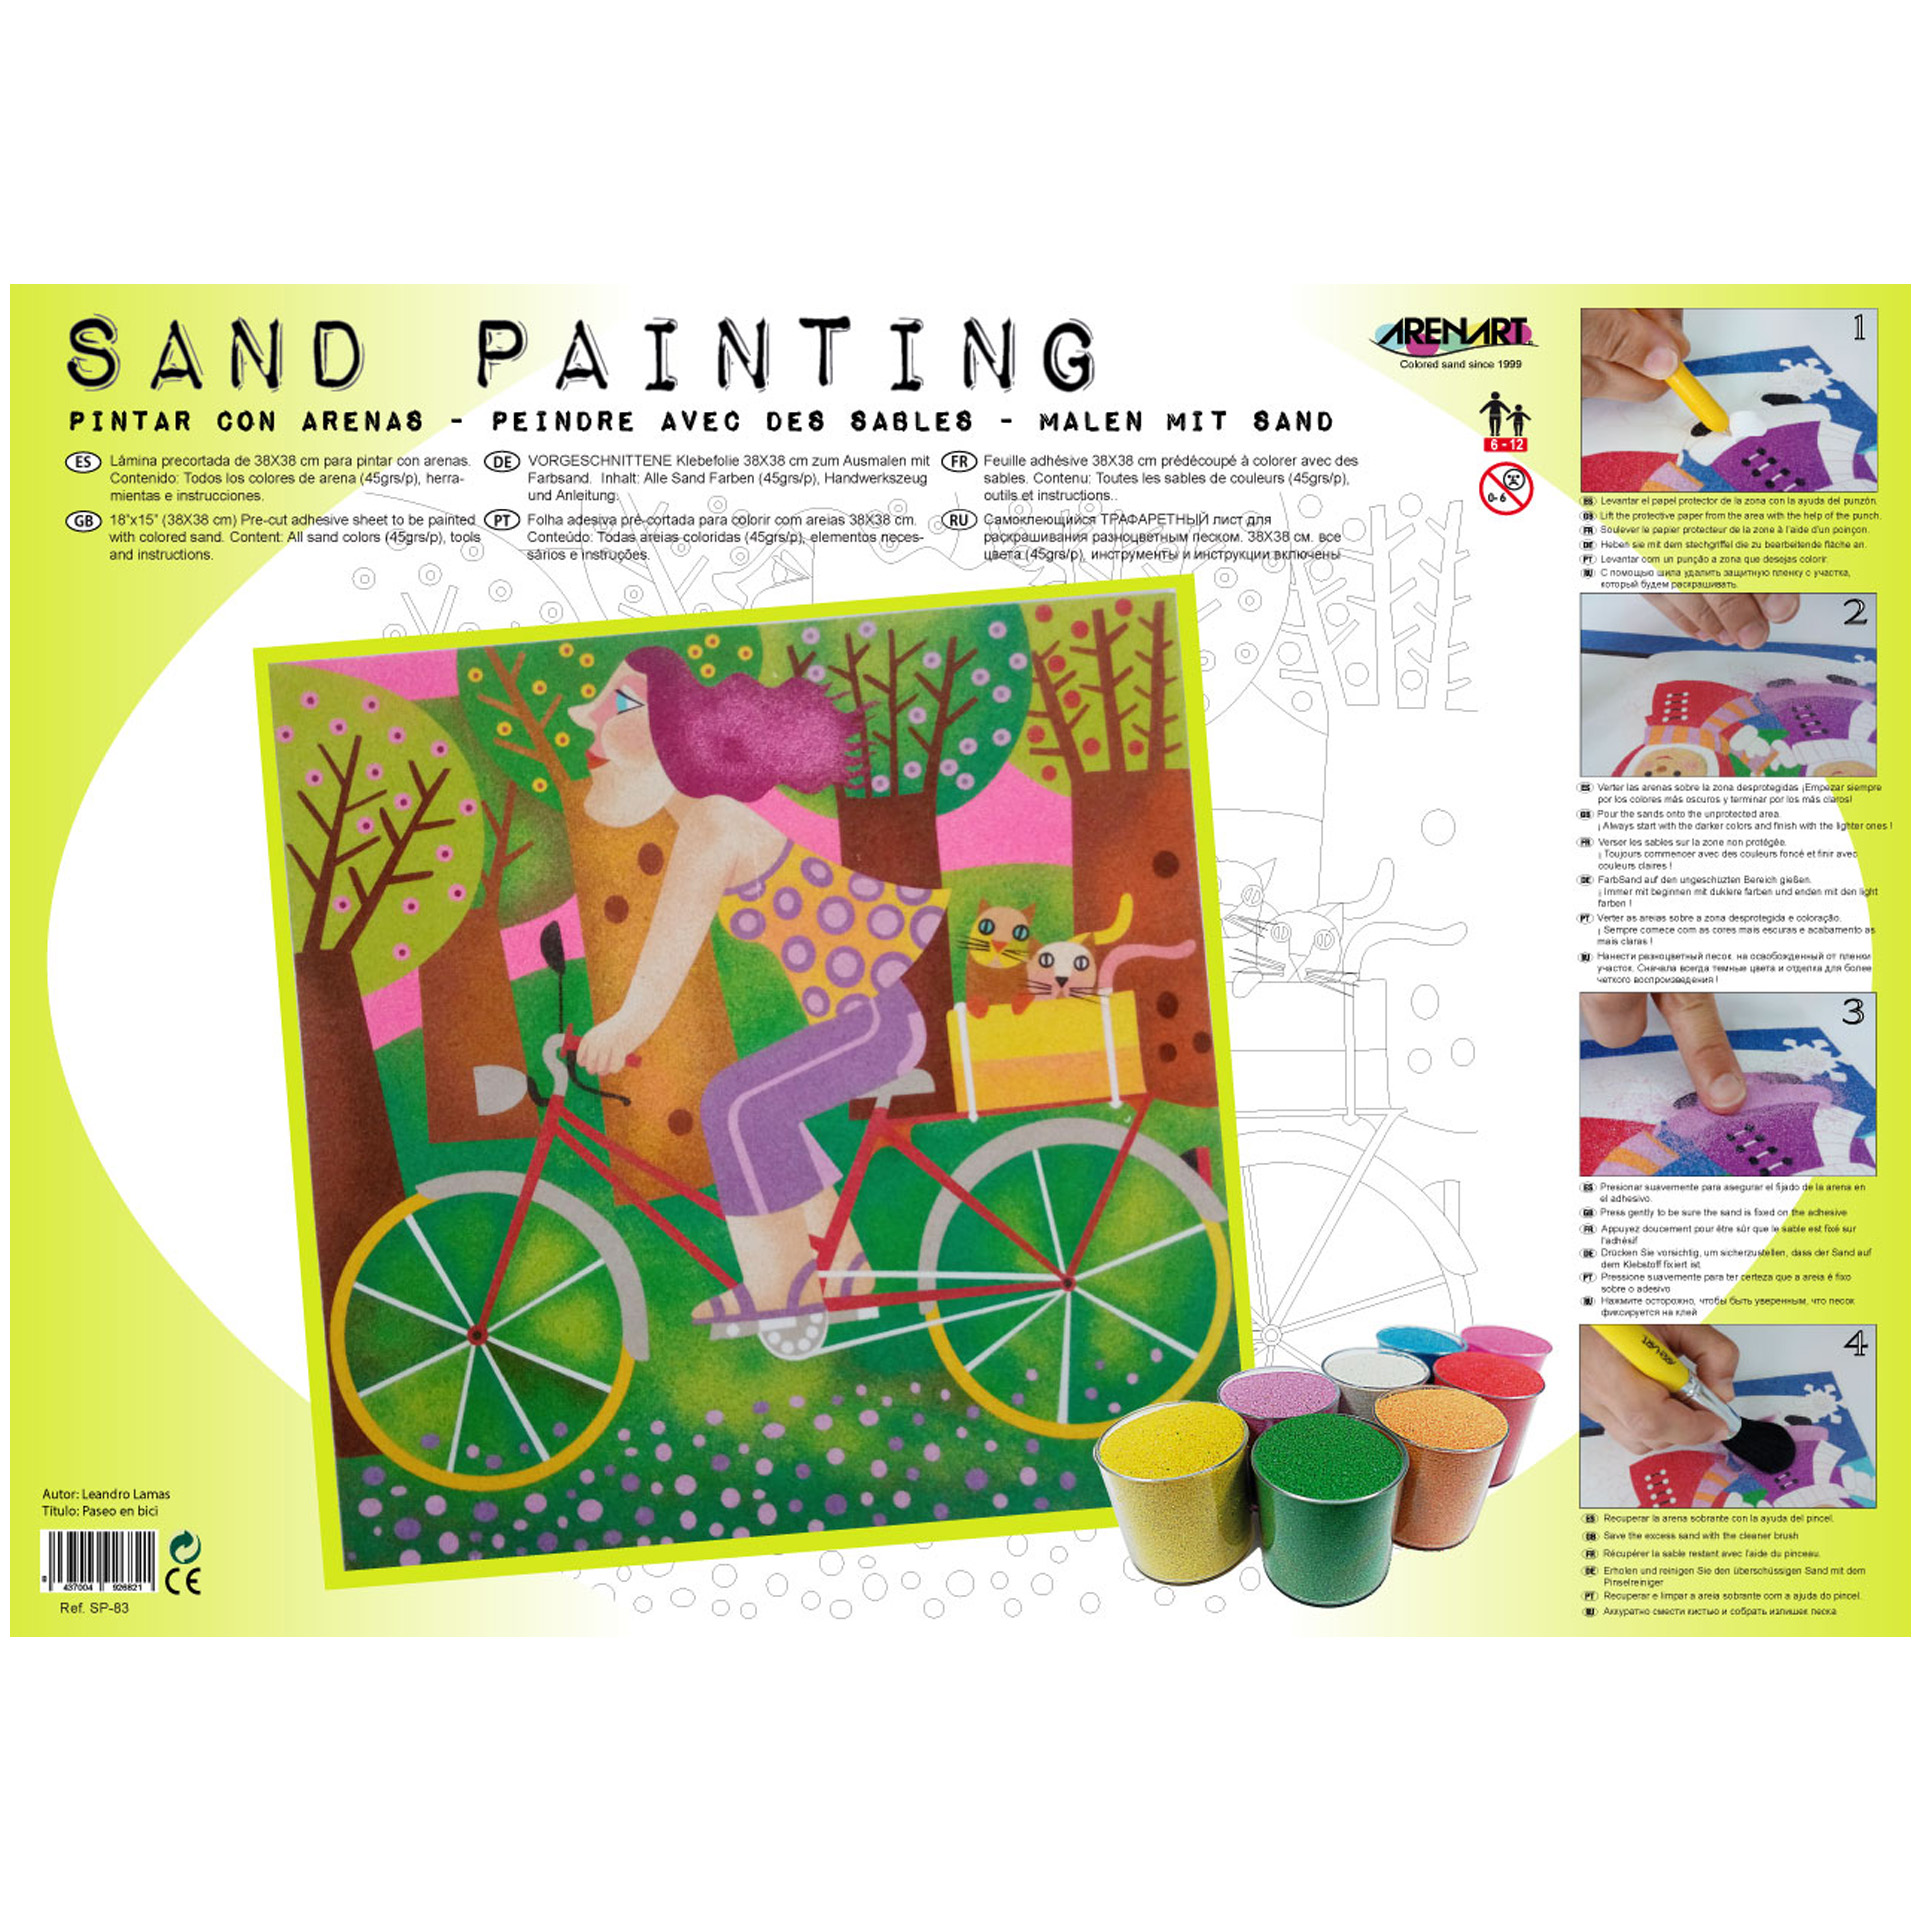 Sand Painting Paseo en Bici